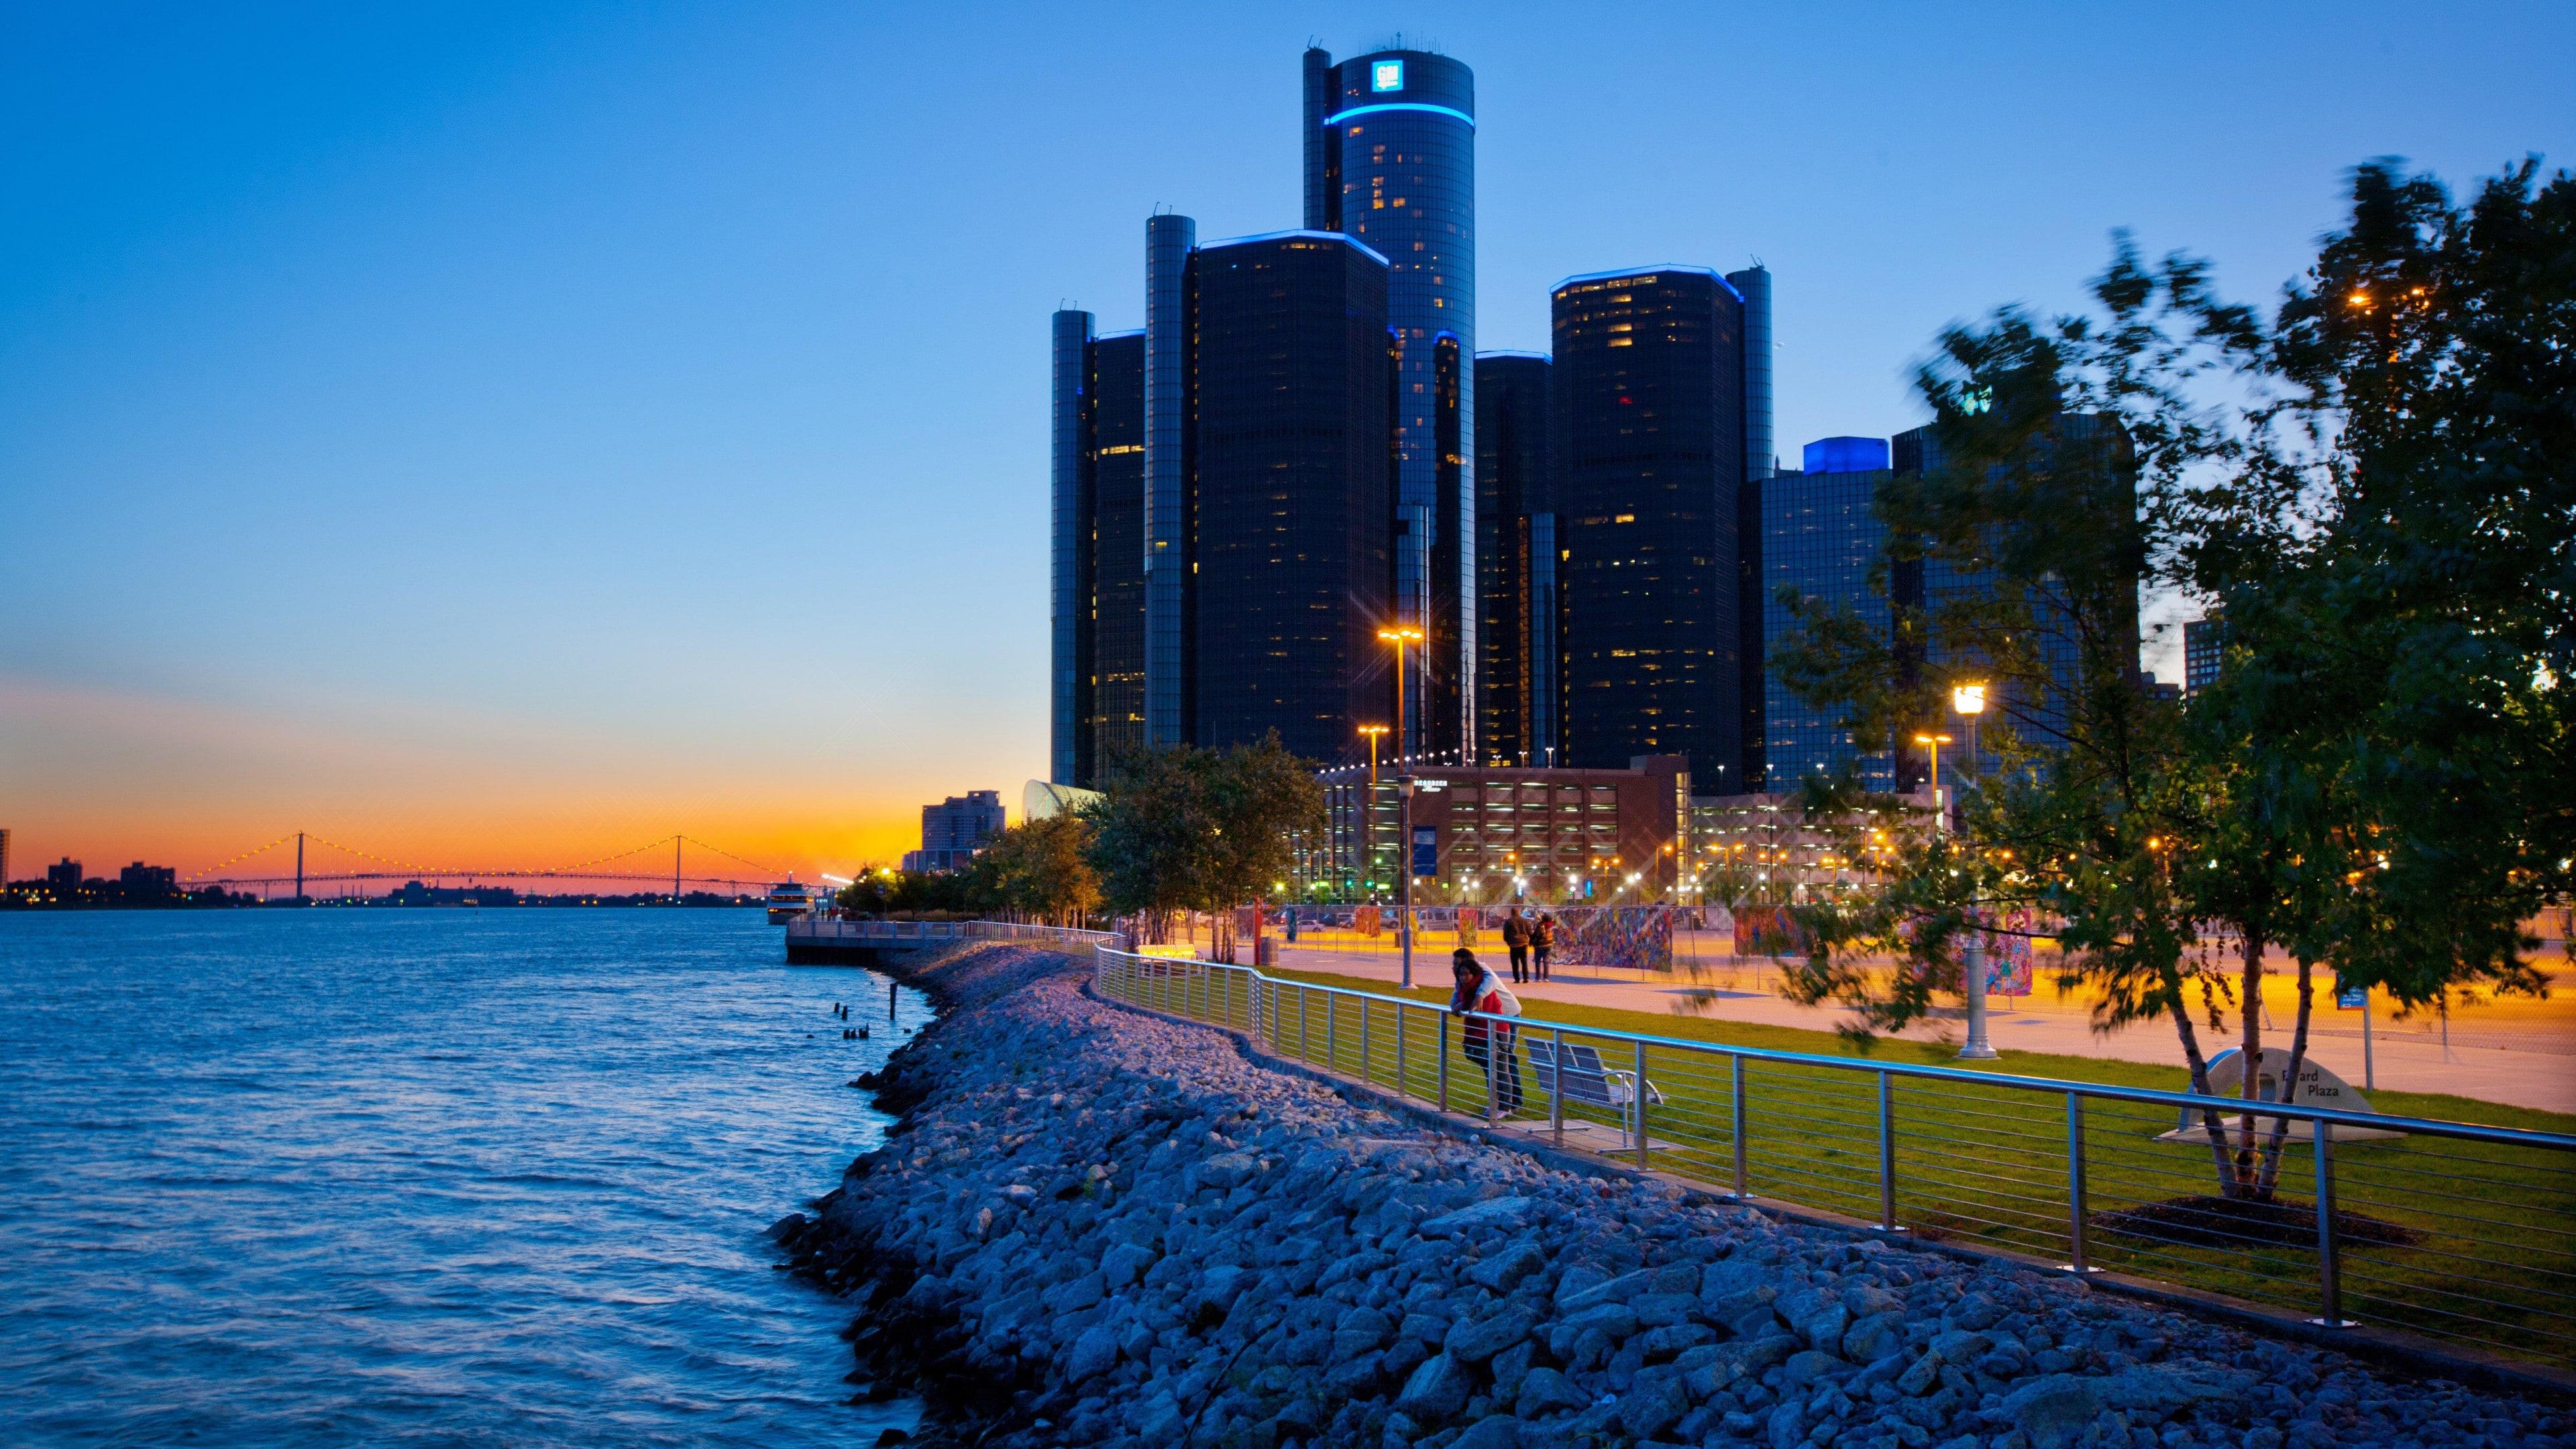 Detroit HD Wallpapers | 7wallpapers.net